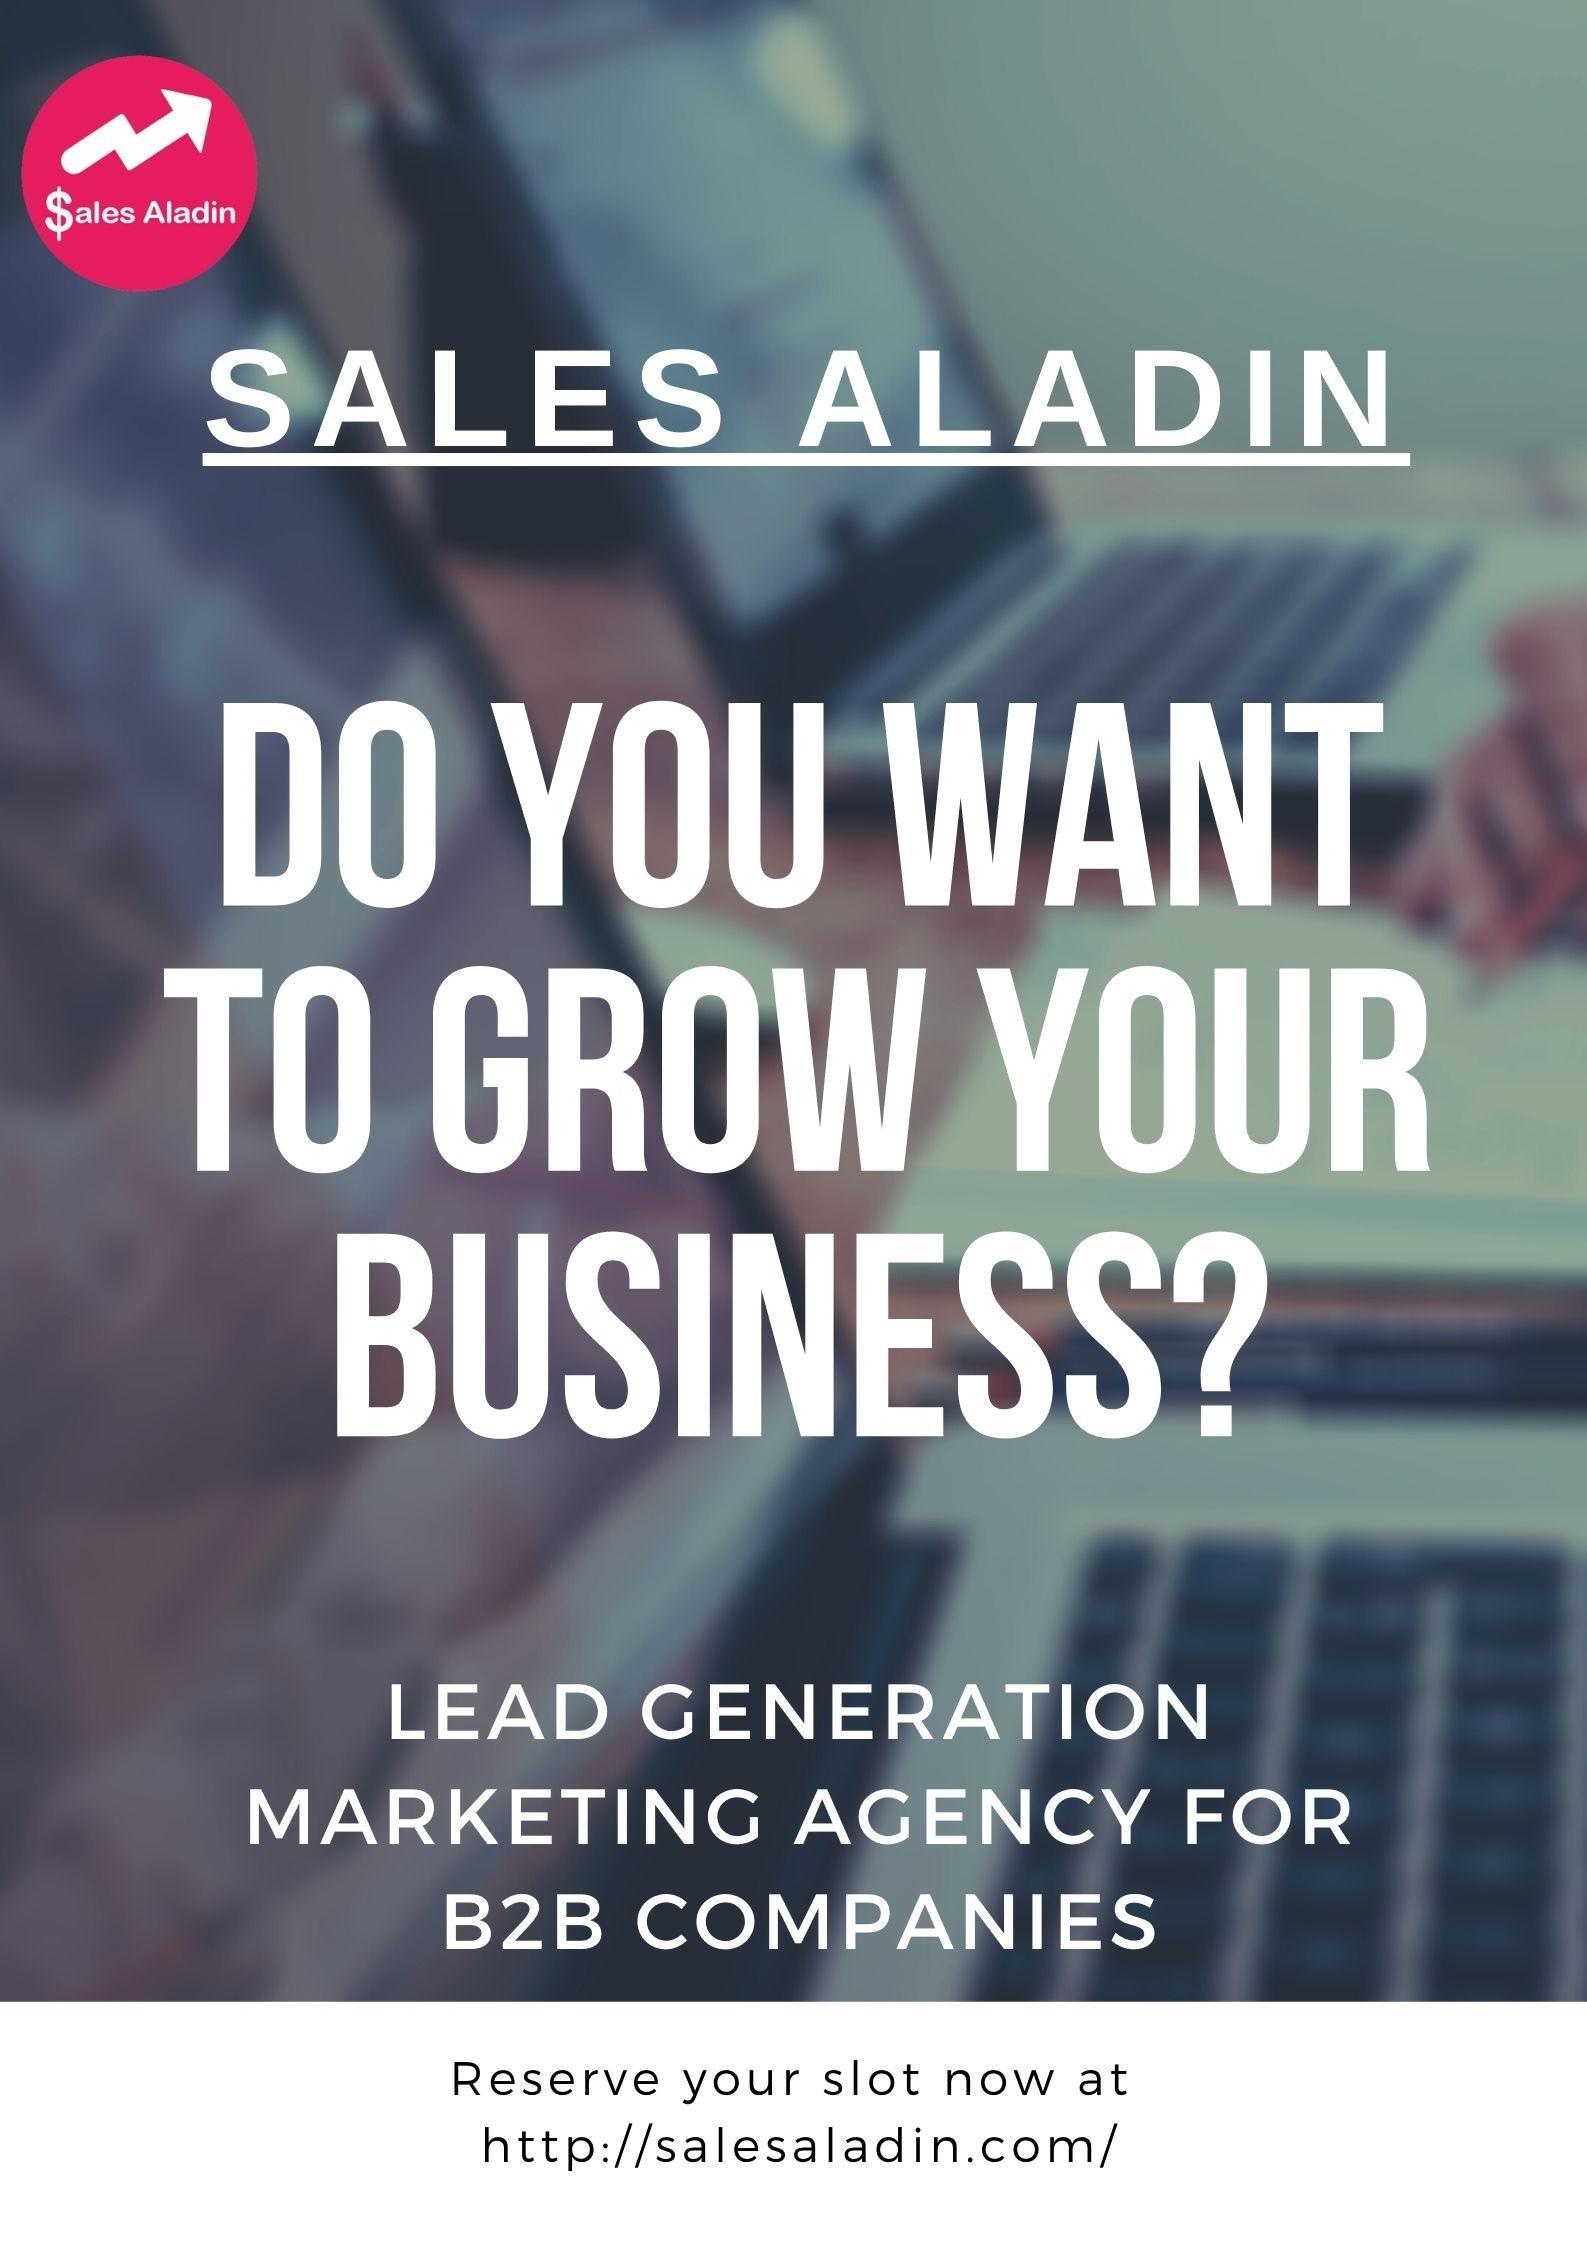 Lead Generation Marketing Agency for B2B Companies